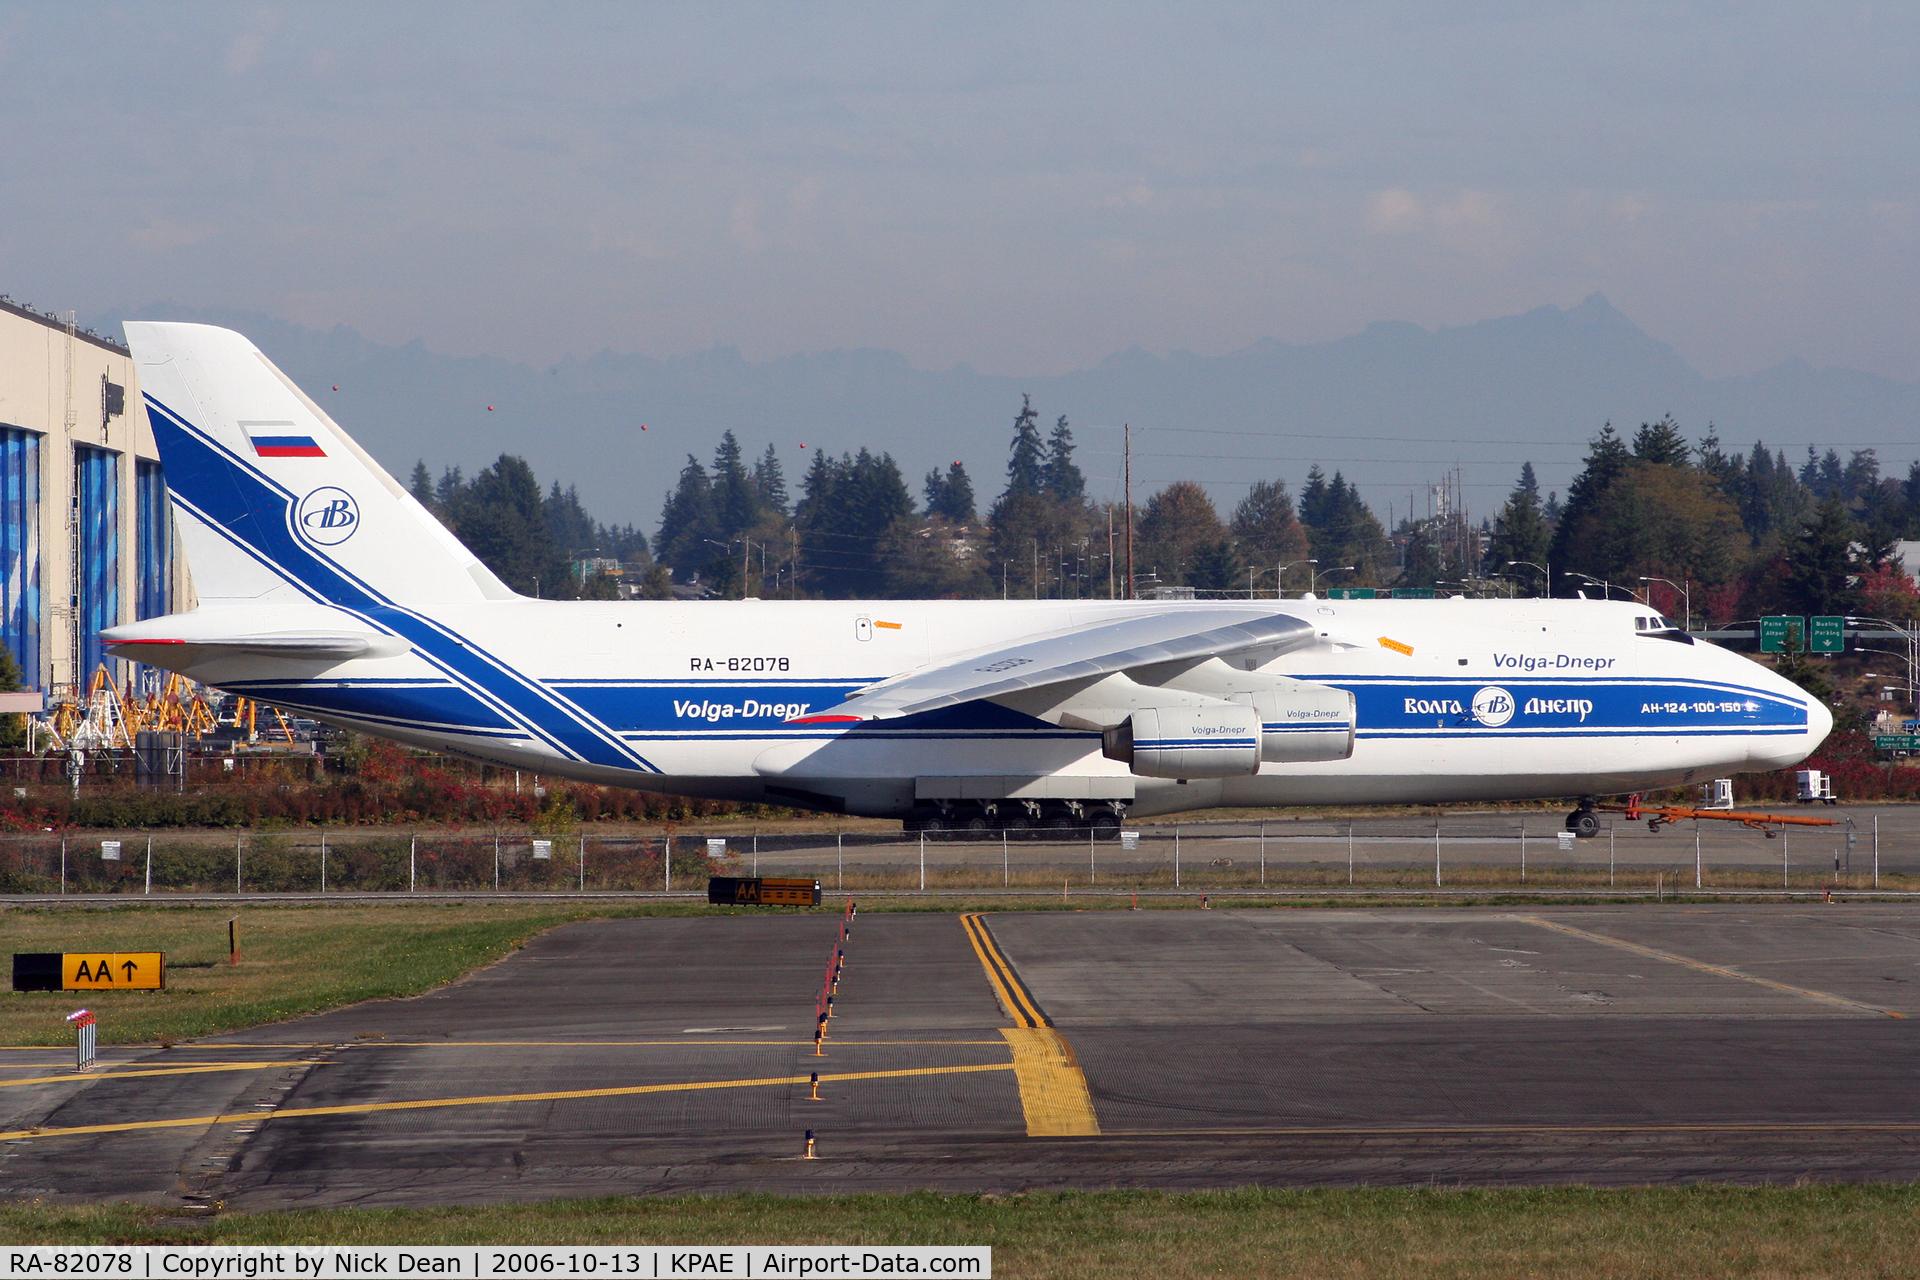 RA-82078, 1996 Antonov AN-124-100 Ruslan C/N 9773054559153, /